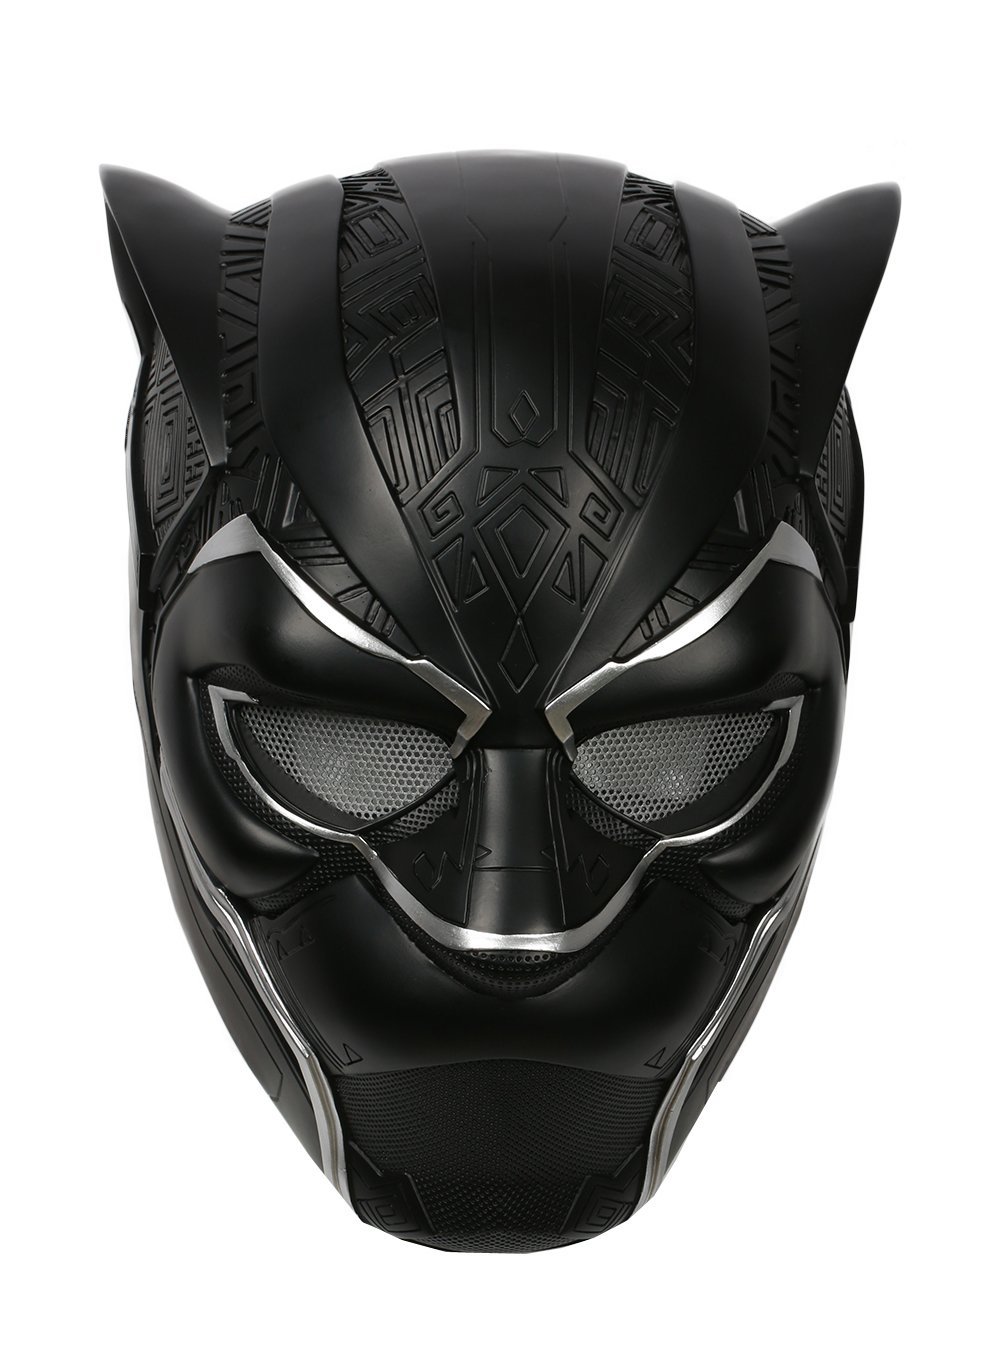 xcoser Black Panther Helmet Deluxe Adult Mask Captain Halloween Party Cosplay Costume S